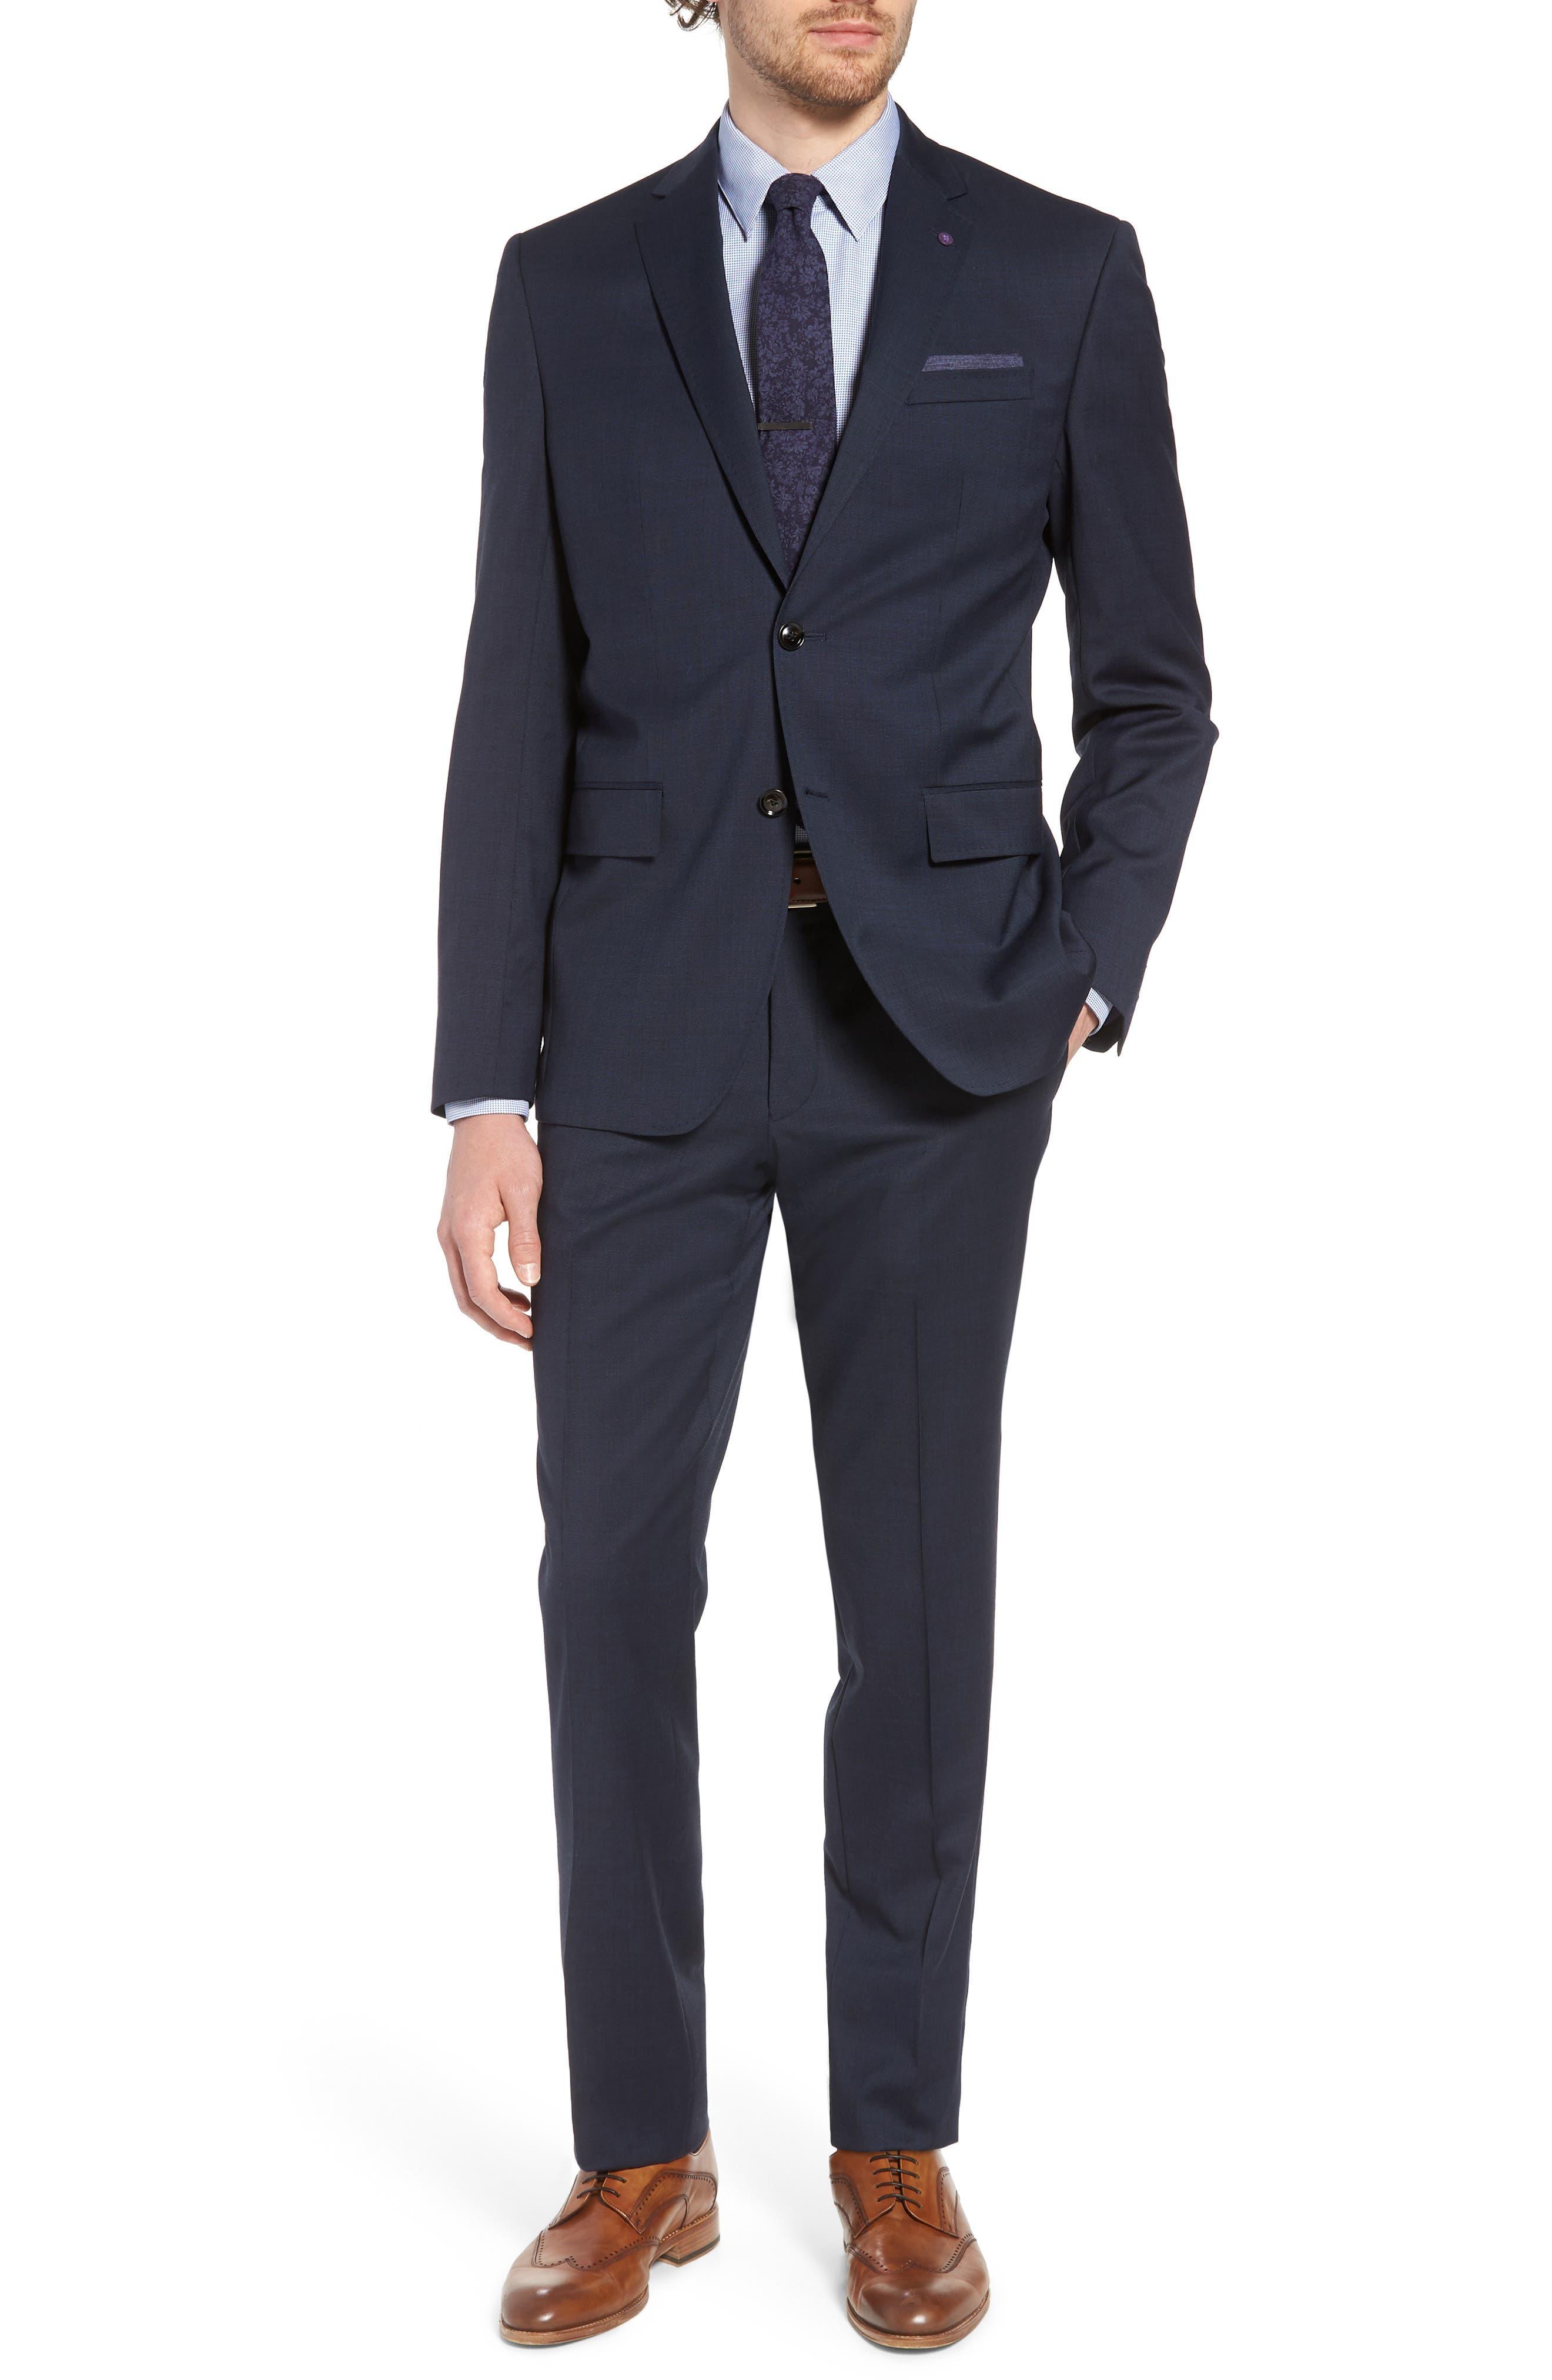 Jay Trim Fit Solid Wool Suit,                         Main,                         color,